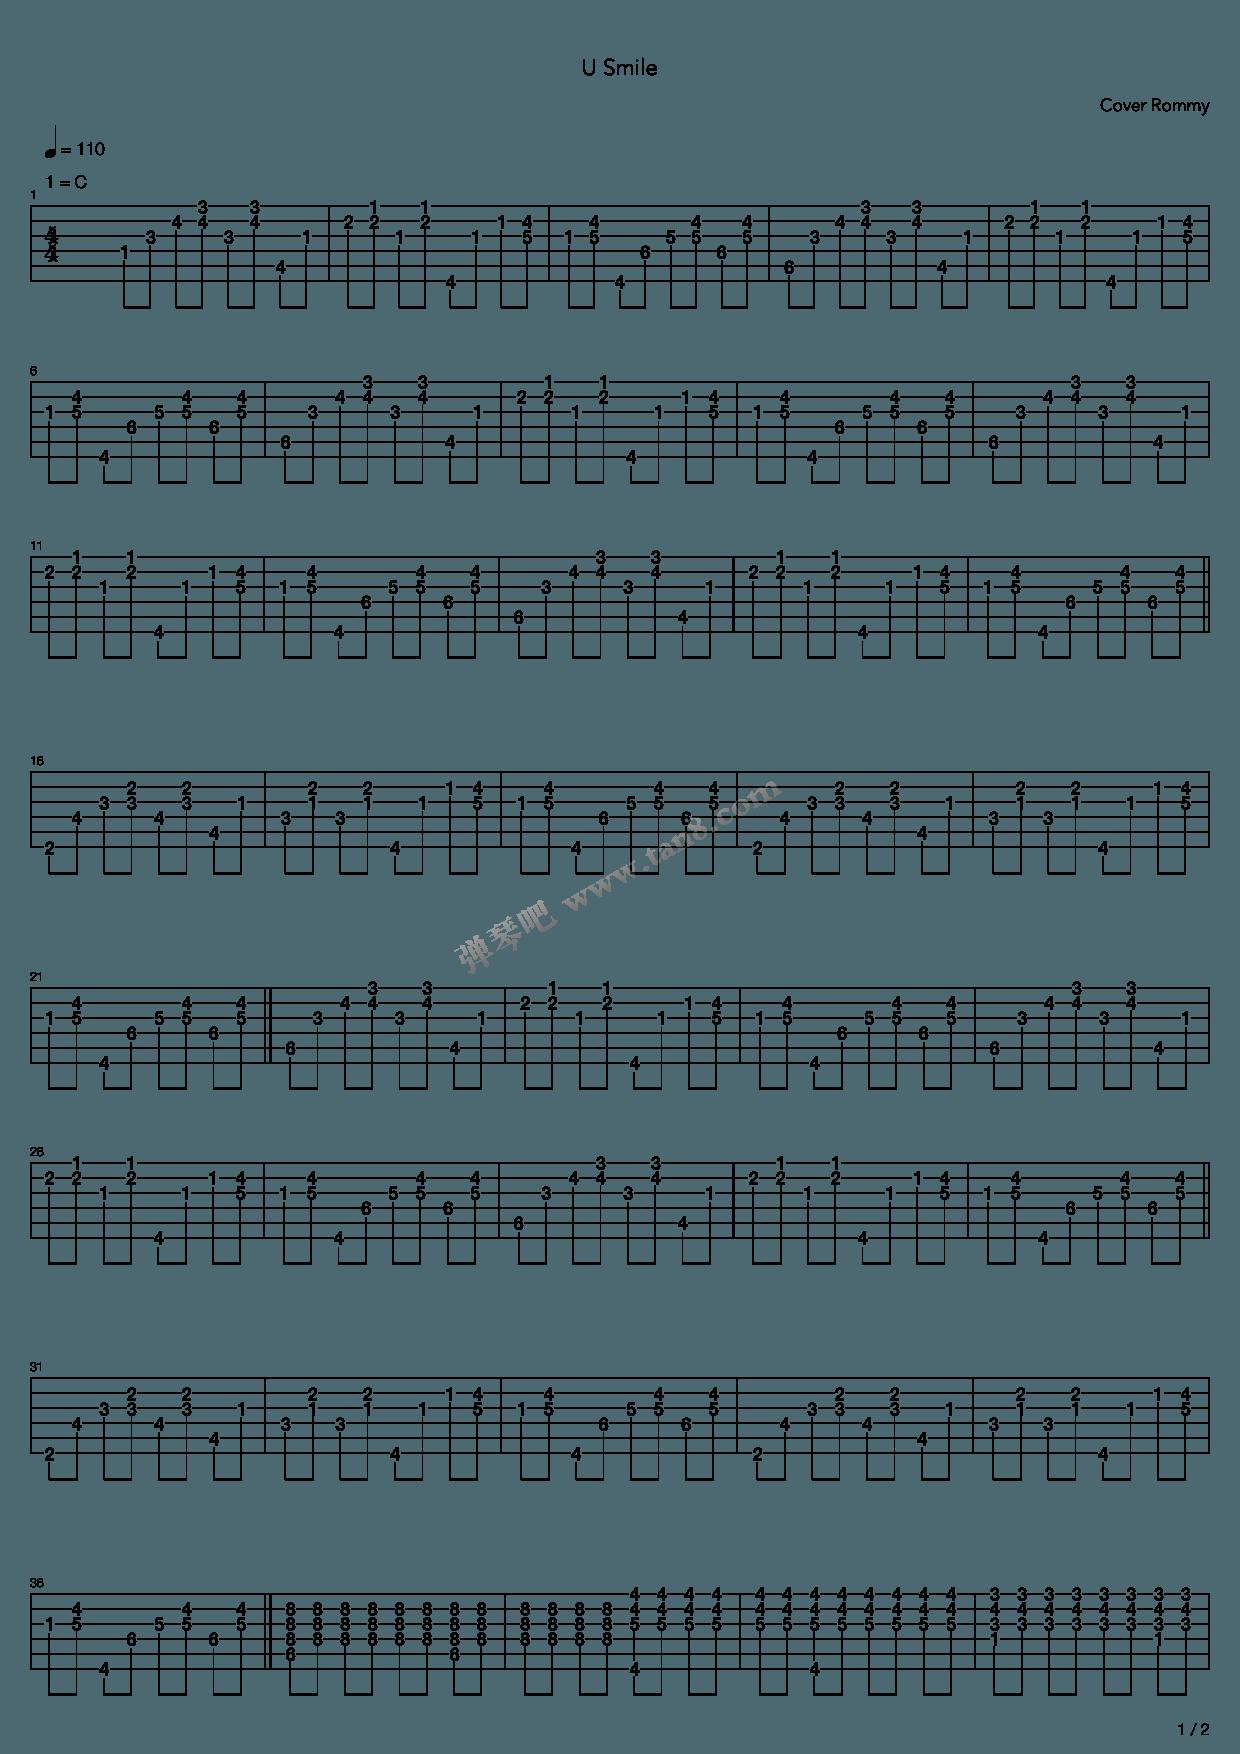 u smile by justin bieber guitar tabs chords sheet music